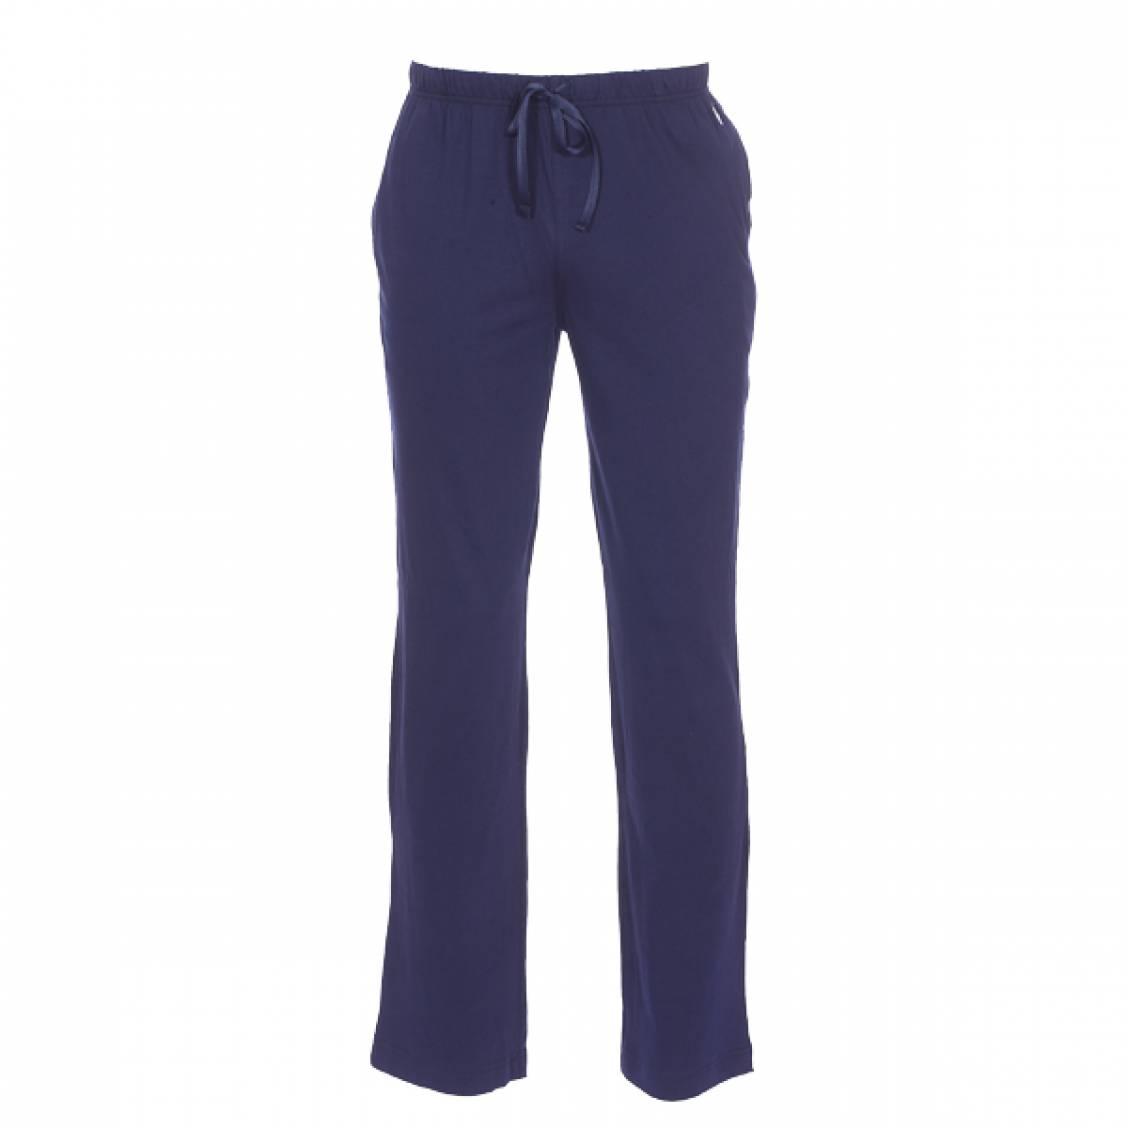 Pantalon de pyjama  en jersey de coton bleu marine